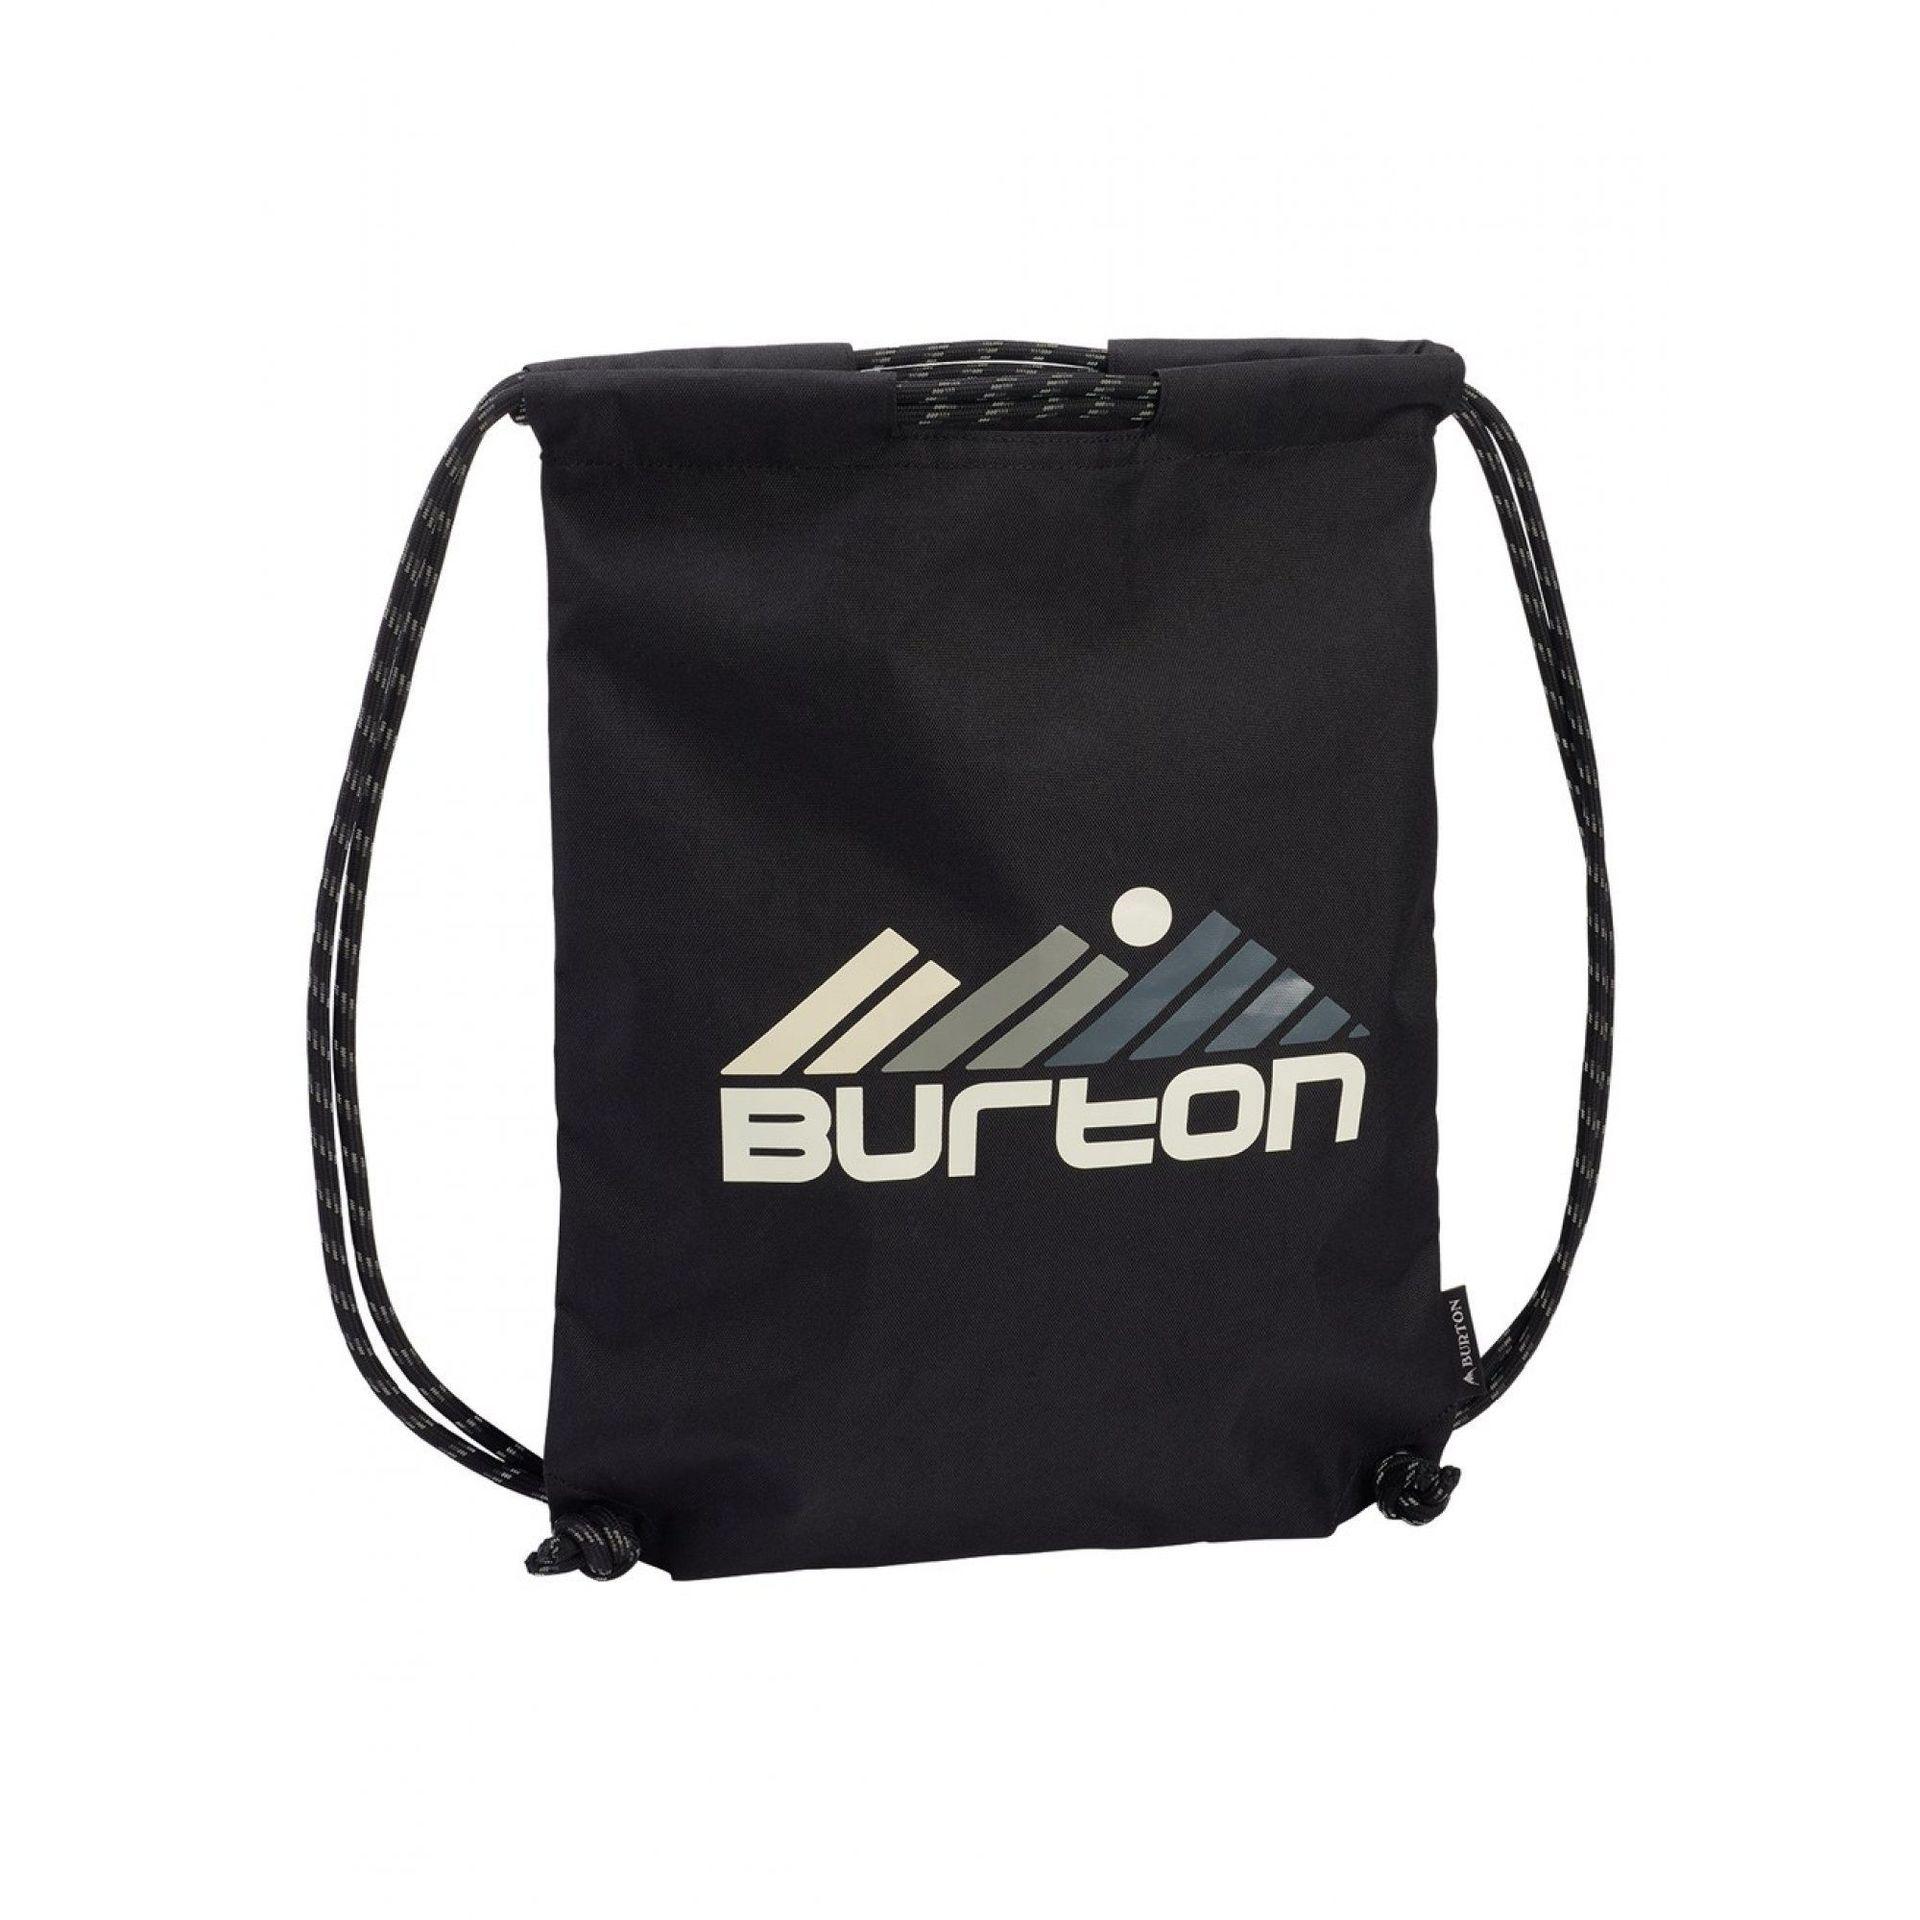 PLECAK BURTON CINCH TRUE BLACK 166971-002